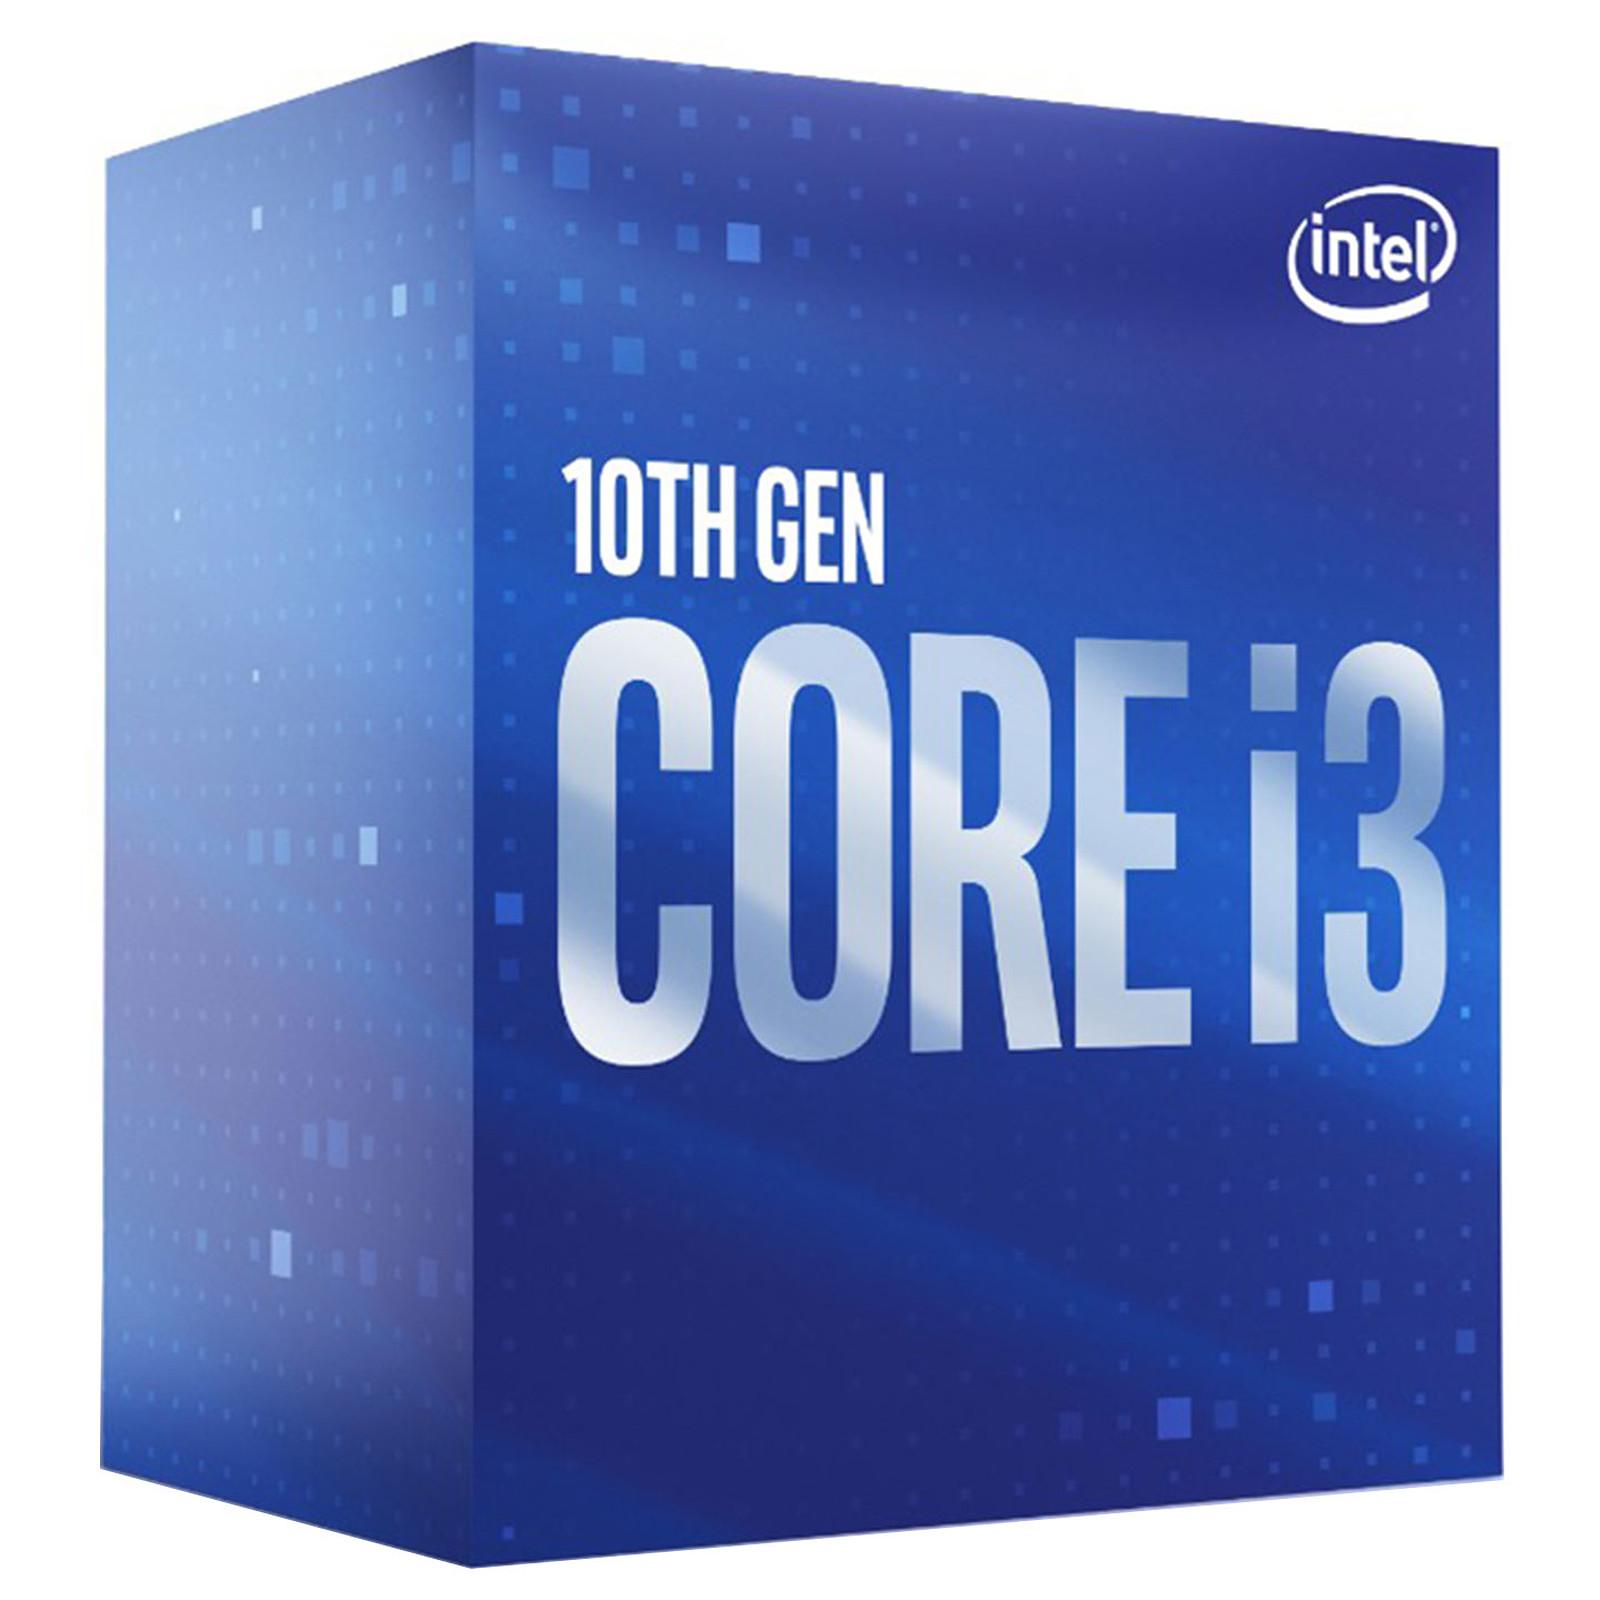 Intel Core i3-10100 (3.6 GHz / 4.3 GHz)